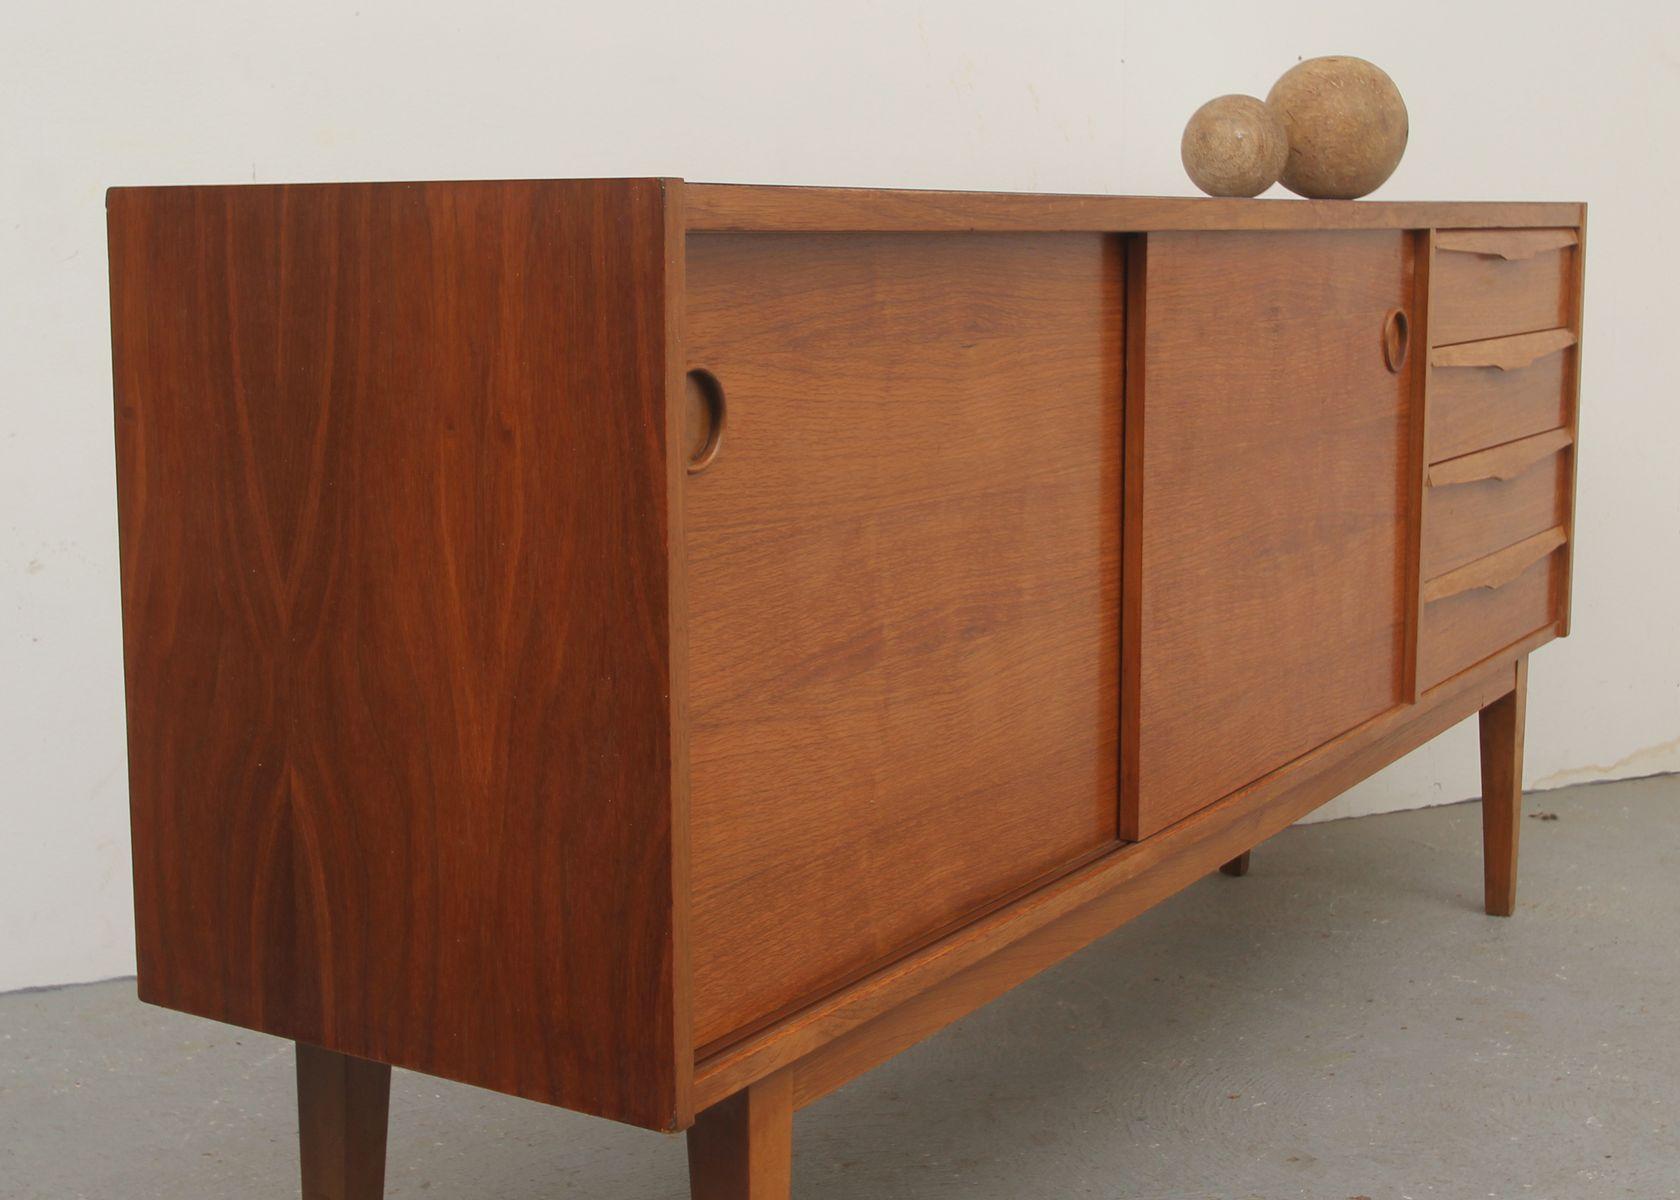 enfilade en teck et stratifi avec portes coulissantes 1950s en vente sur pamono. Black Bedroom Furniture Sets. Home Design Ideas